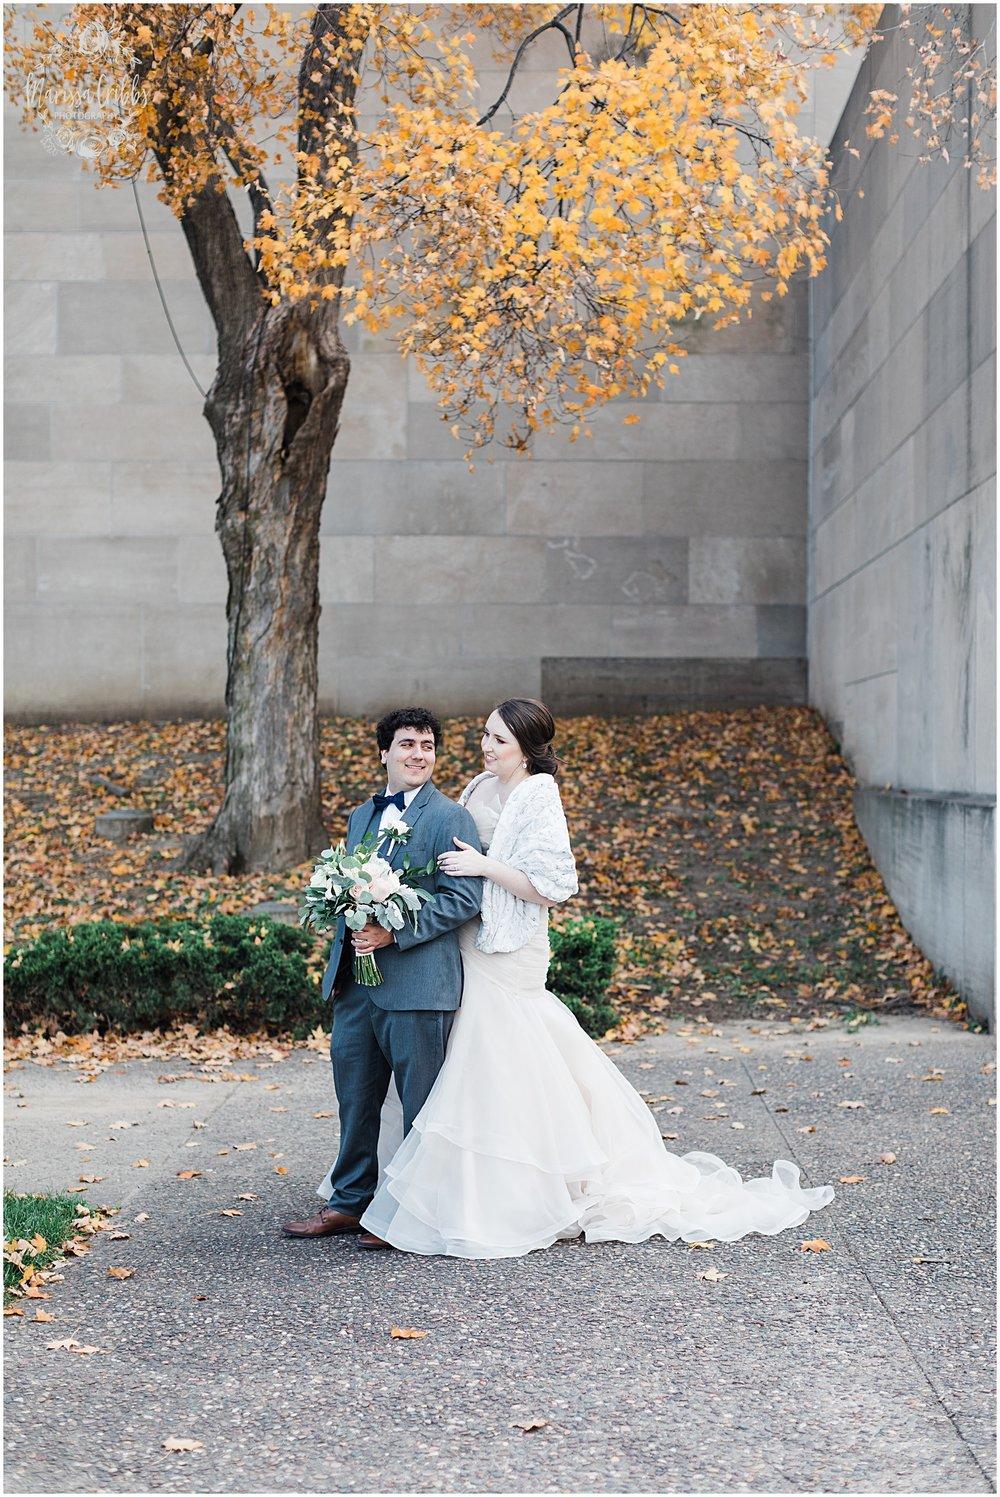 JULIA & AUSTIN MADRID THEATRE WEDDING | MARISSA CRIBBS PHOTOGRAPHY_7113.jpg